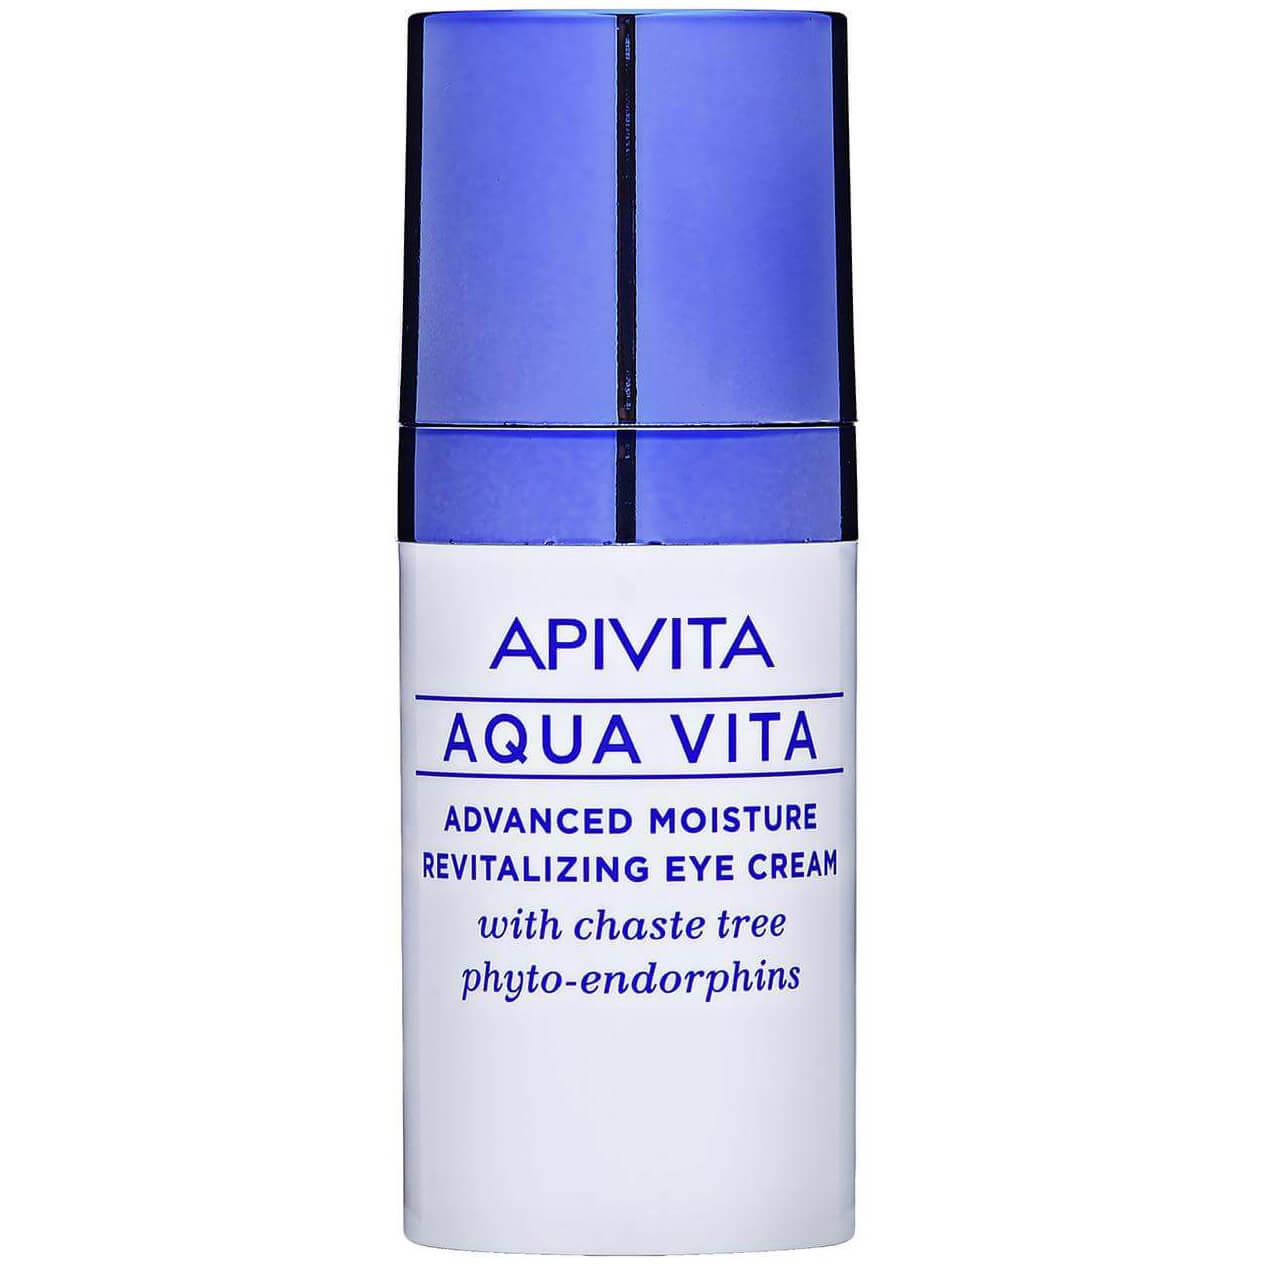 Apivita Aqua Vita Κρέμα Εντατικής Ενυδάτωσης & Αναζωογόνησης Ματιών με Φυτοενδορ ομορφιά   φροντίδα ματιών   ενυδάτωση και λάμψη ματιών